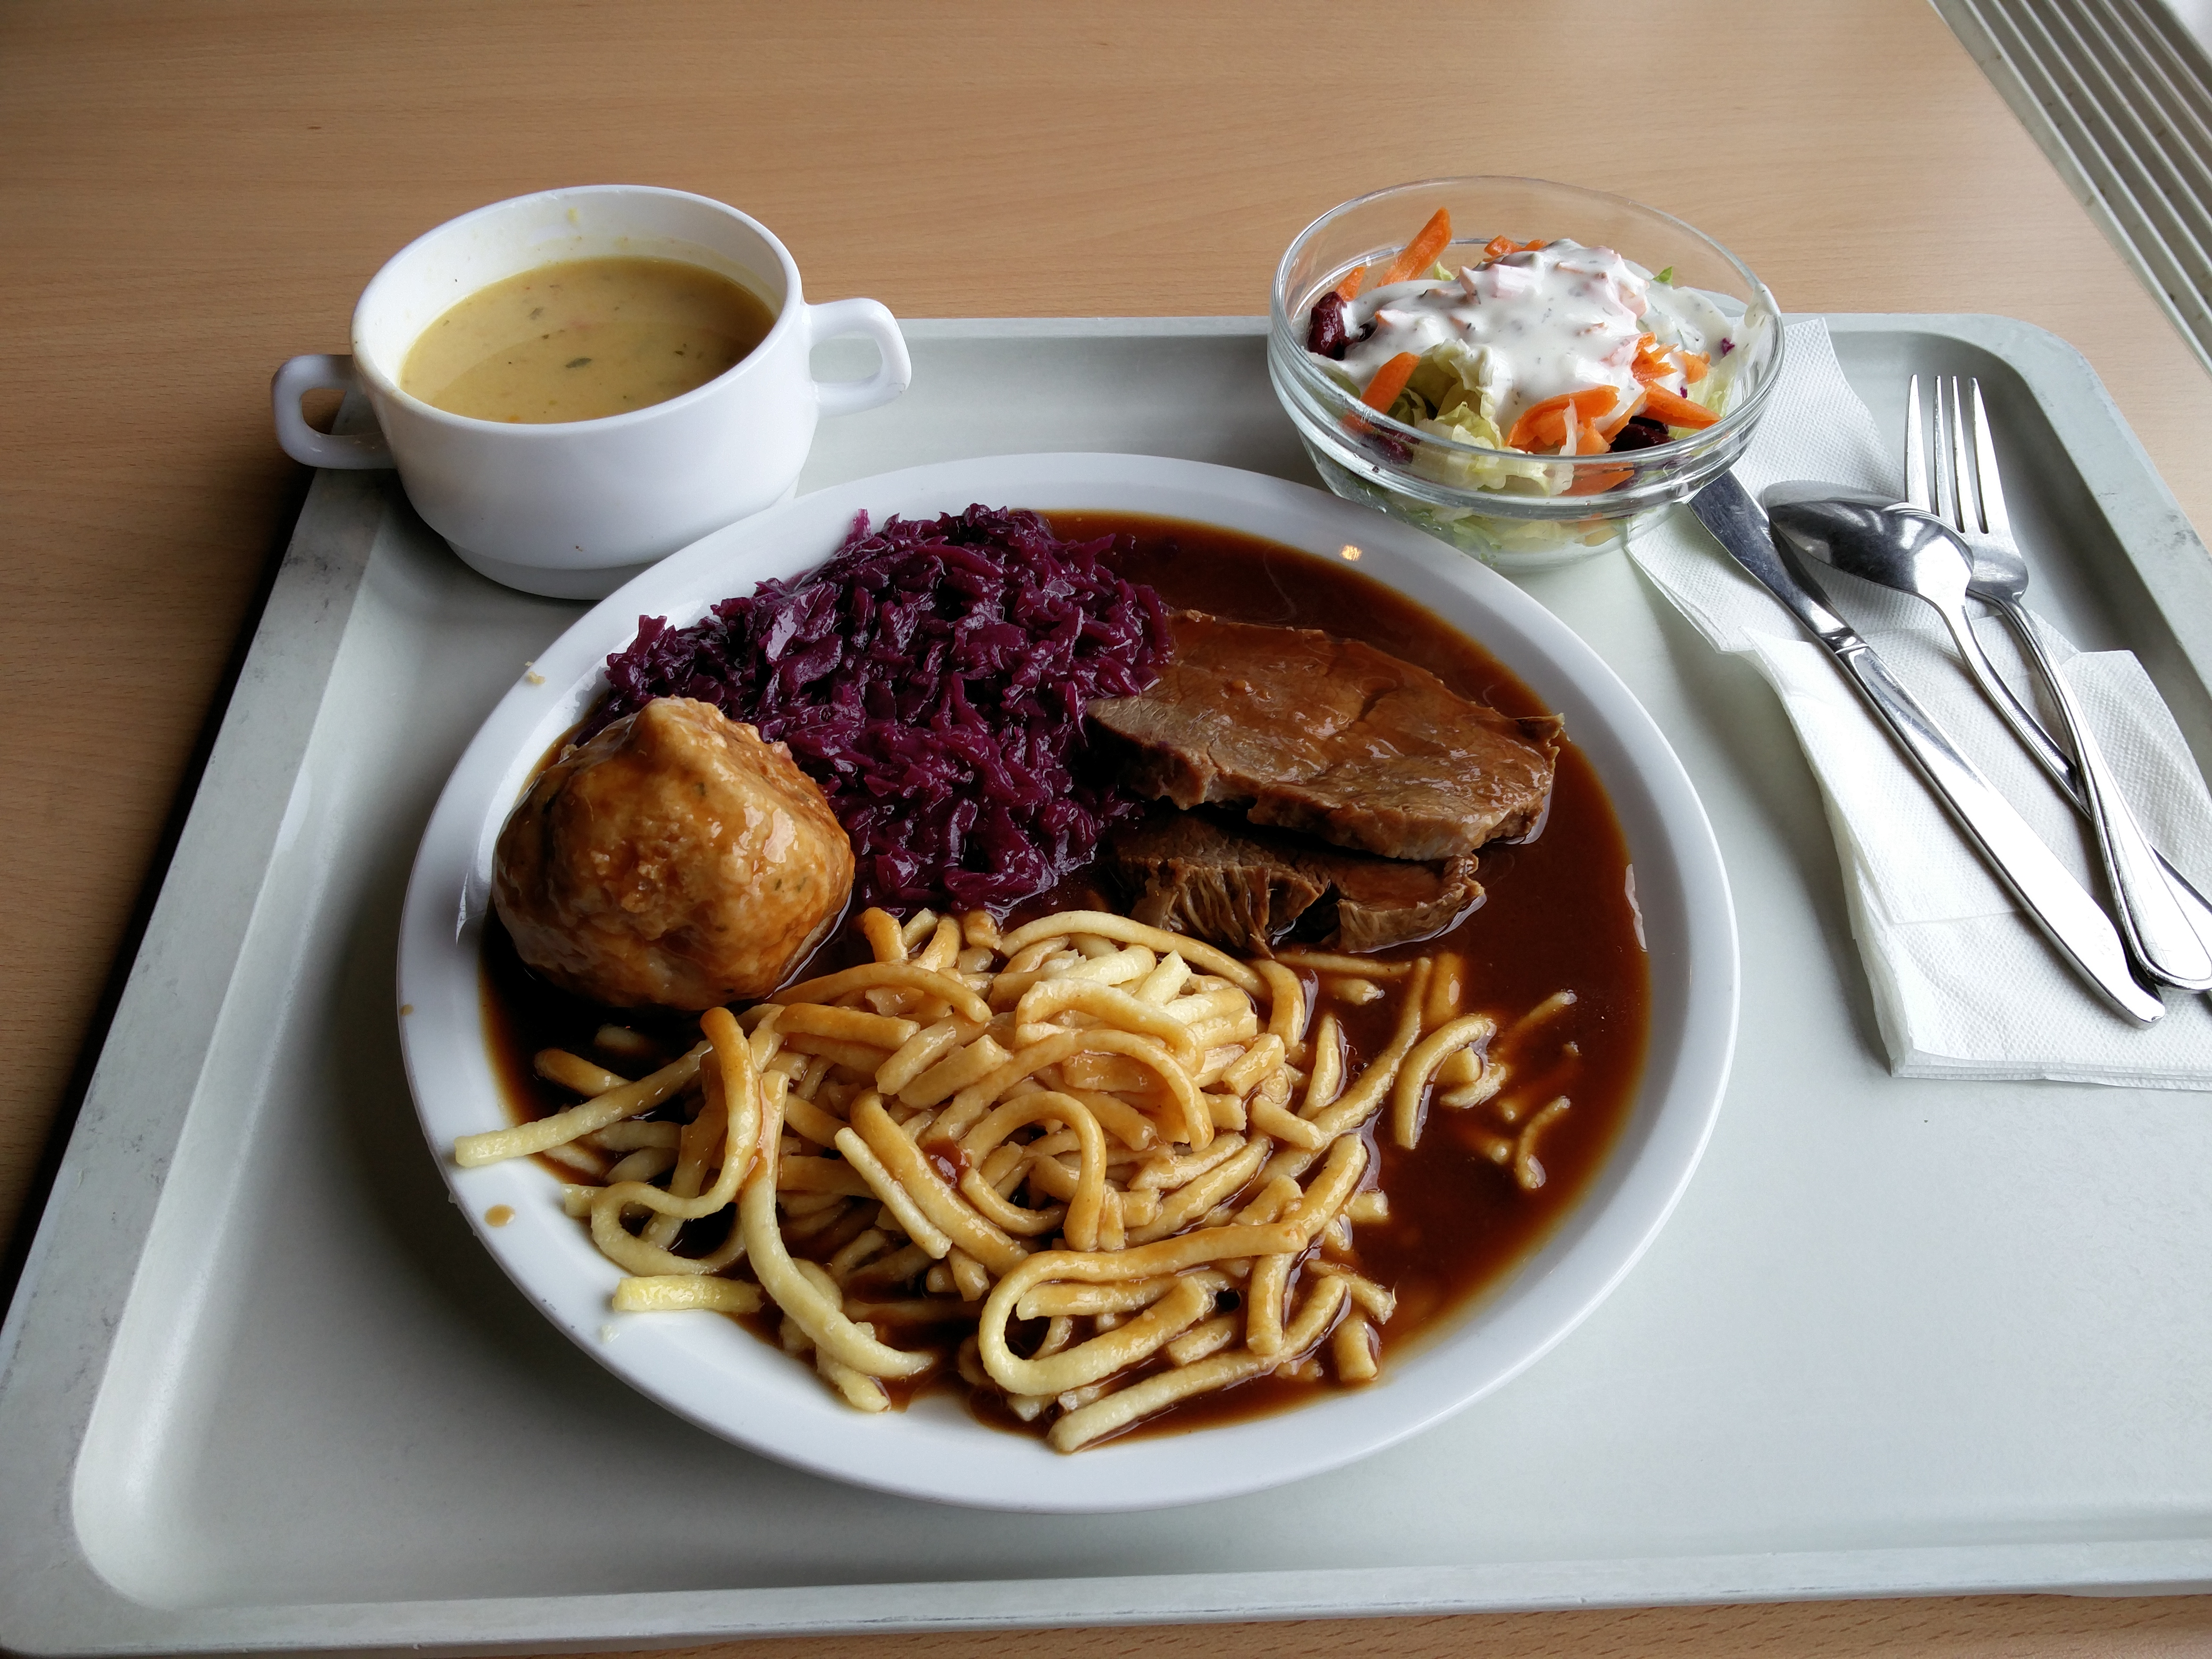 https://foodloader.net/nico_2016-02-03_sauerbraten-spaetzle-knoedel-rotkraut-suppe-salat.jpg